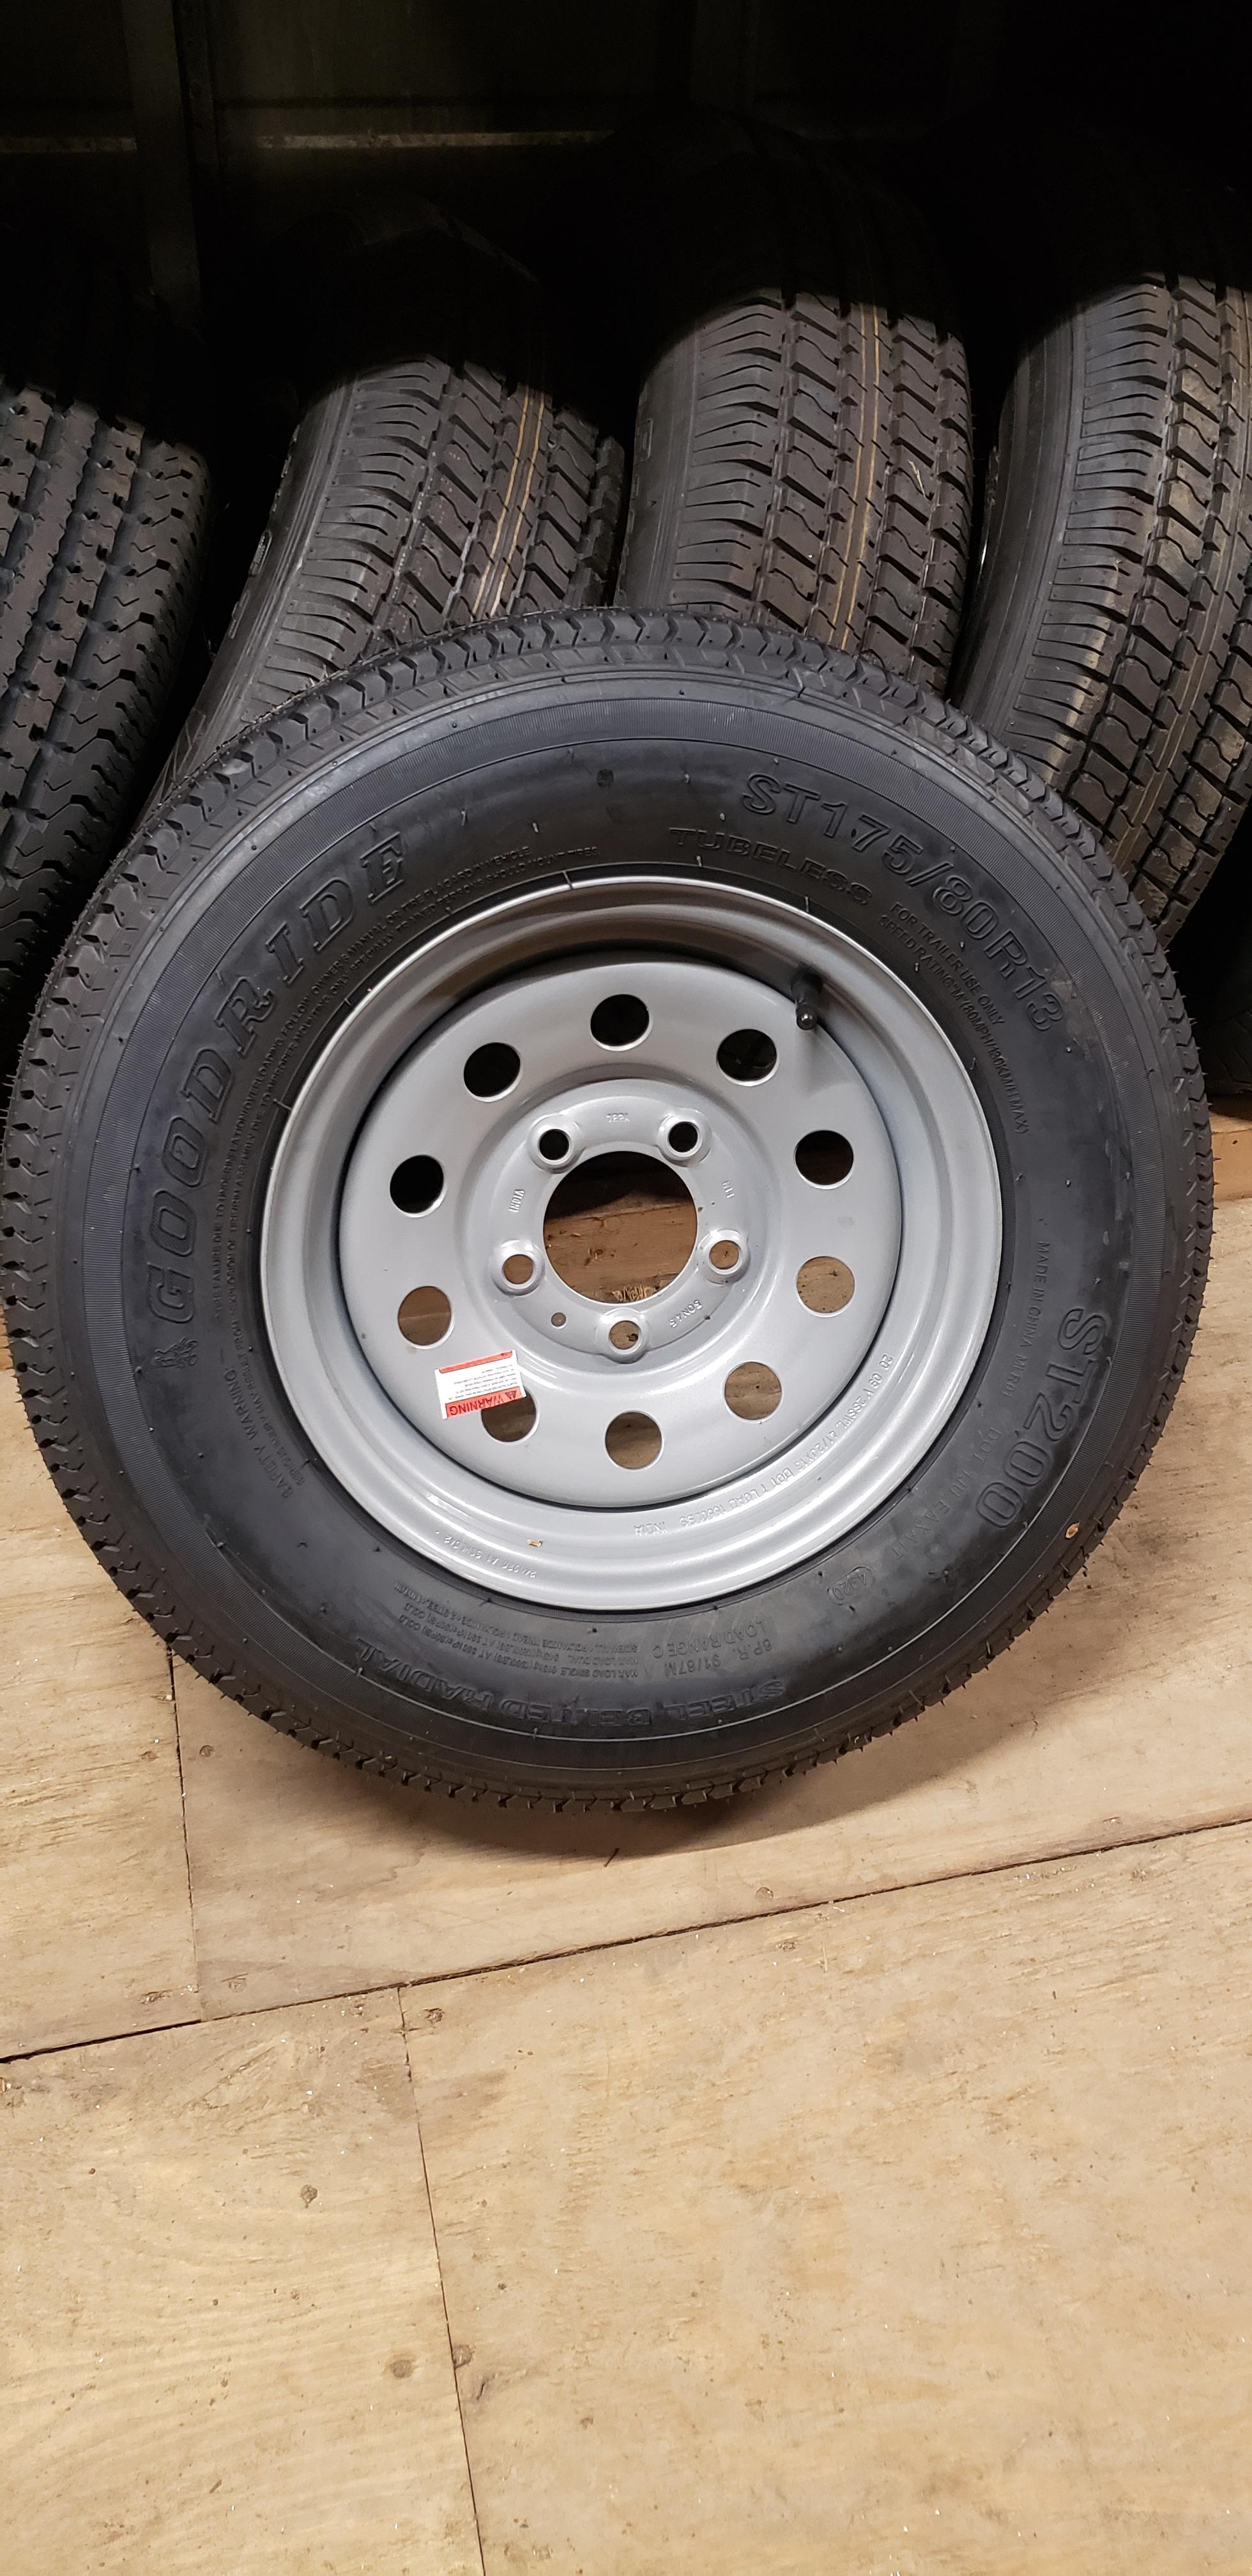 ST175/80R13 Goodride- 2 Colors- Rim and Wheel